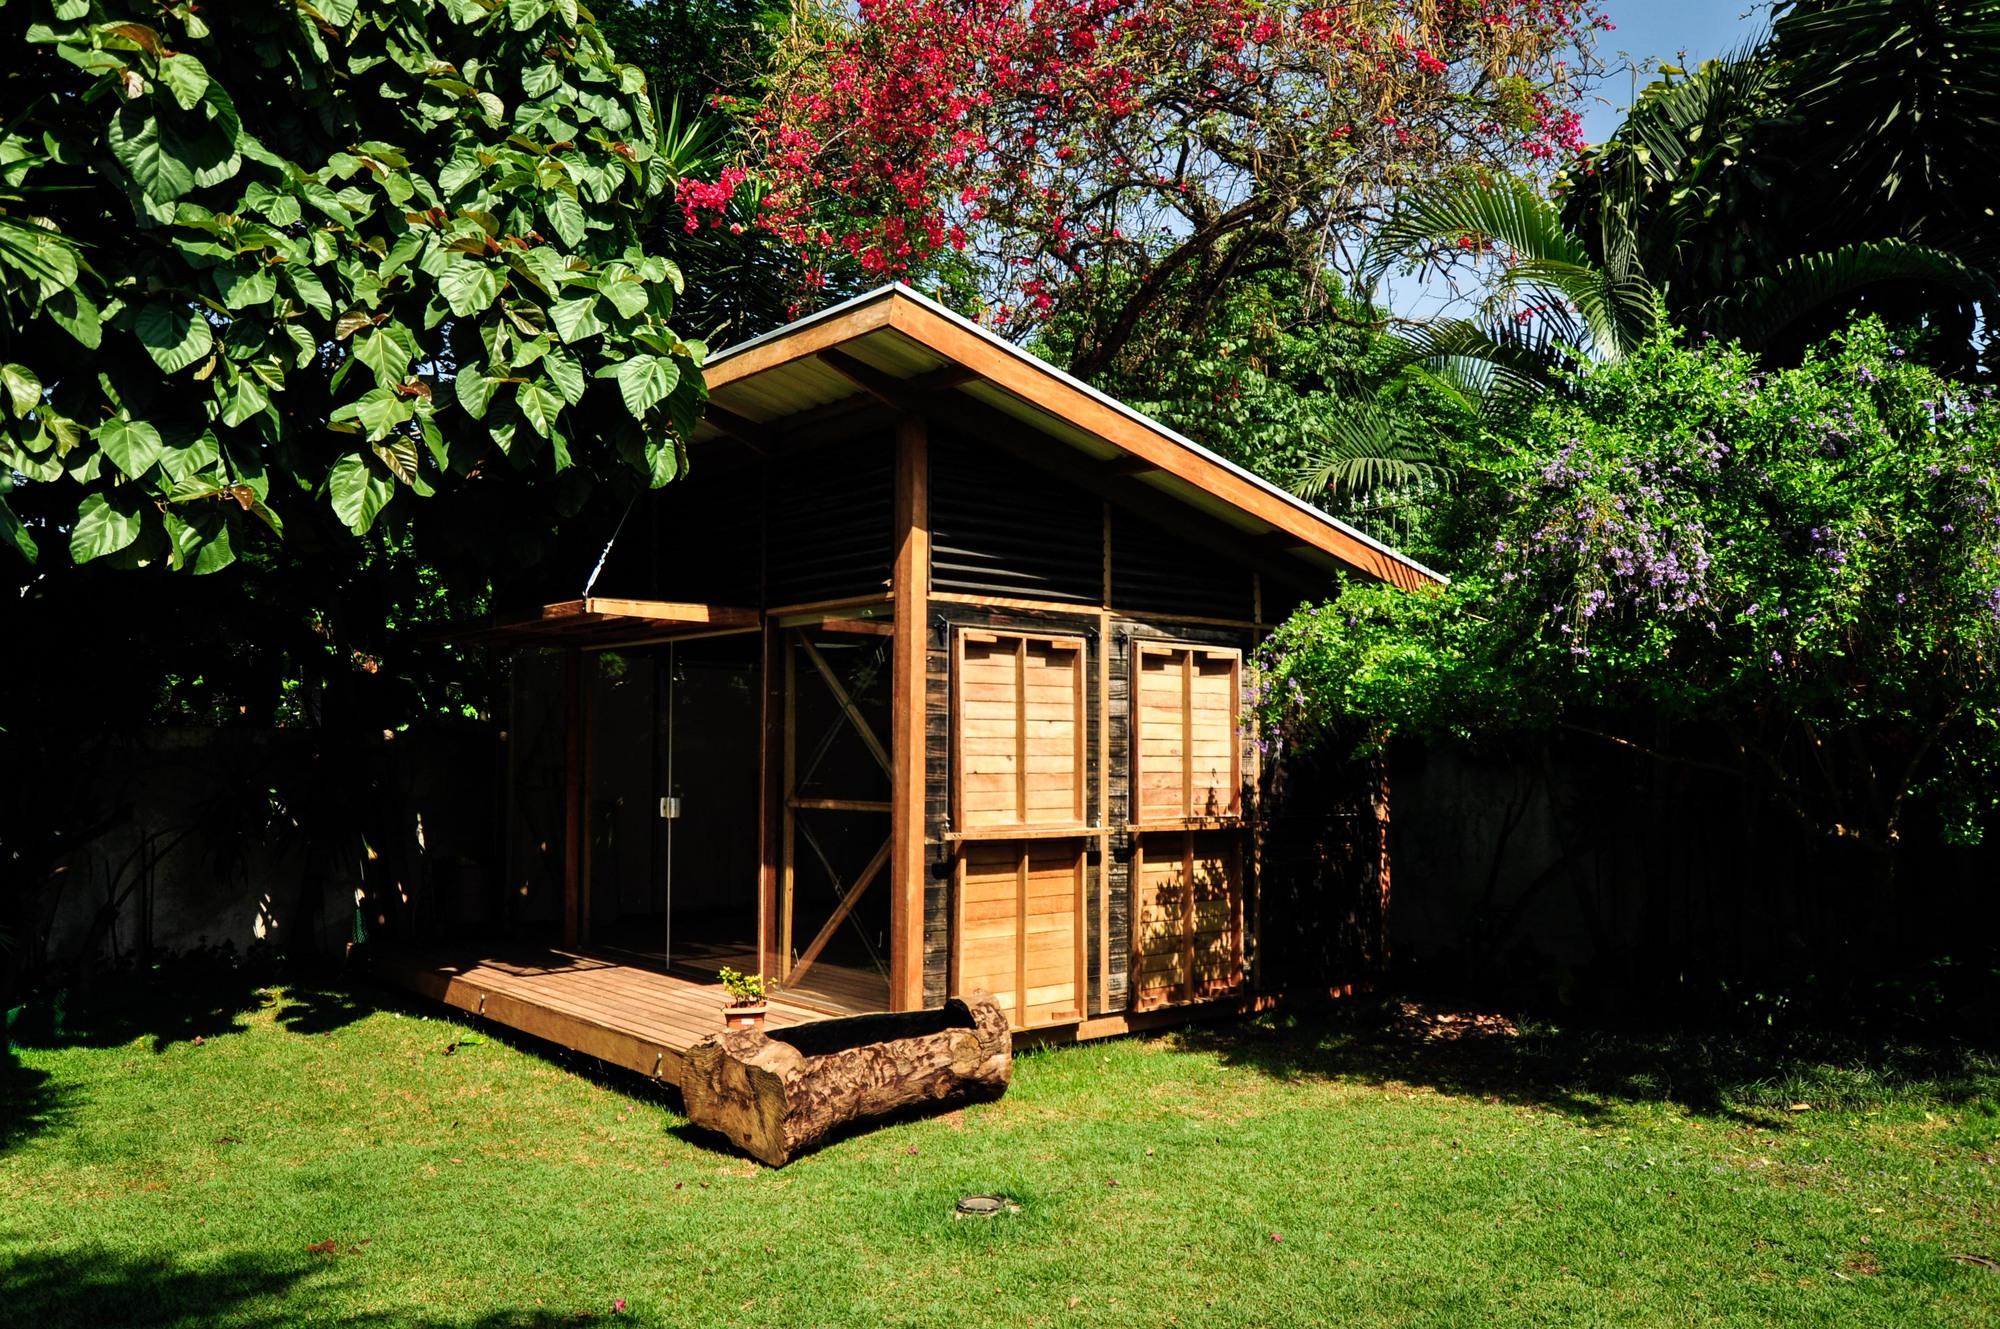 Casa Circular: arquitetas projetam atelier baseado na economia circular e princípios de sustentabilidade